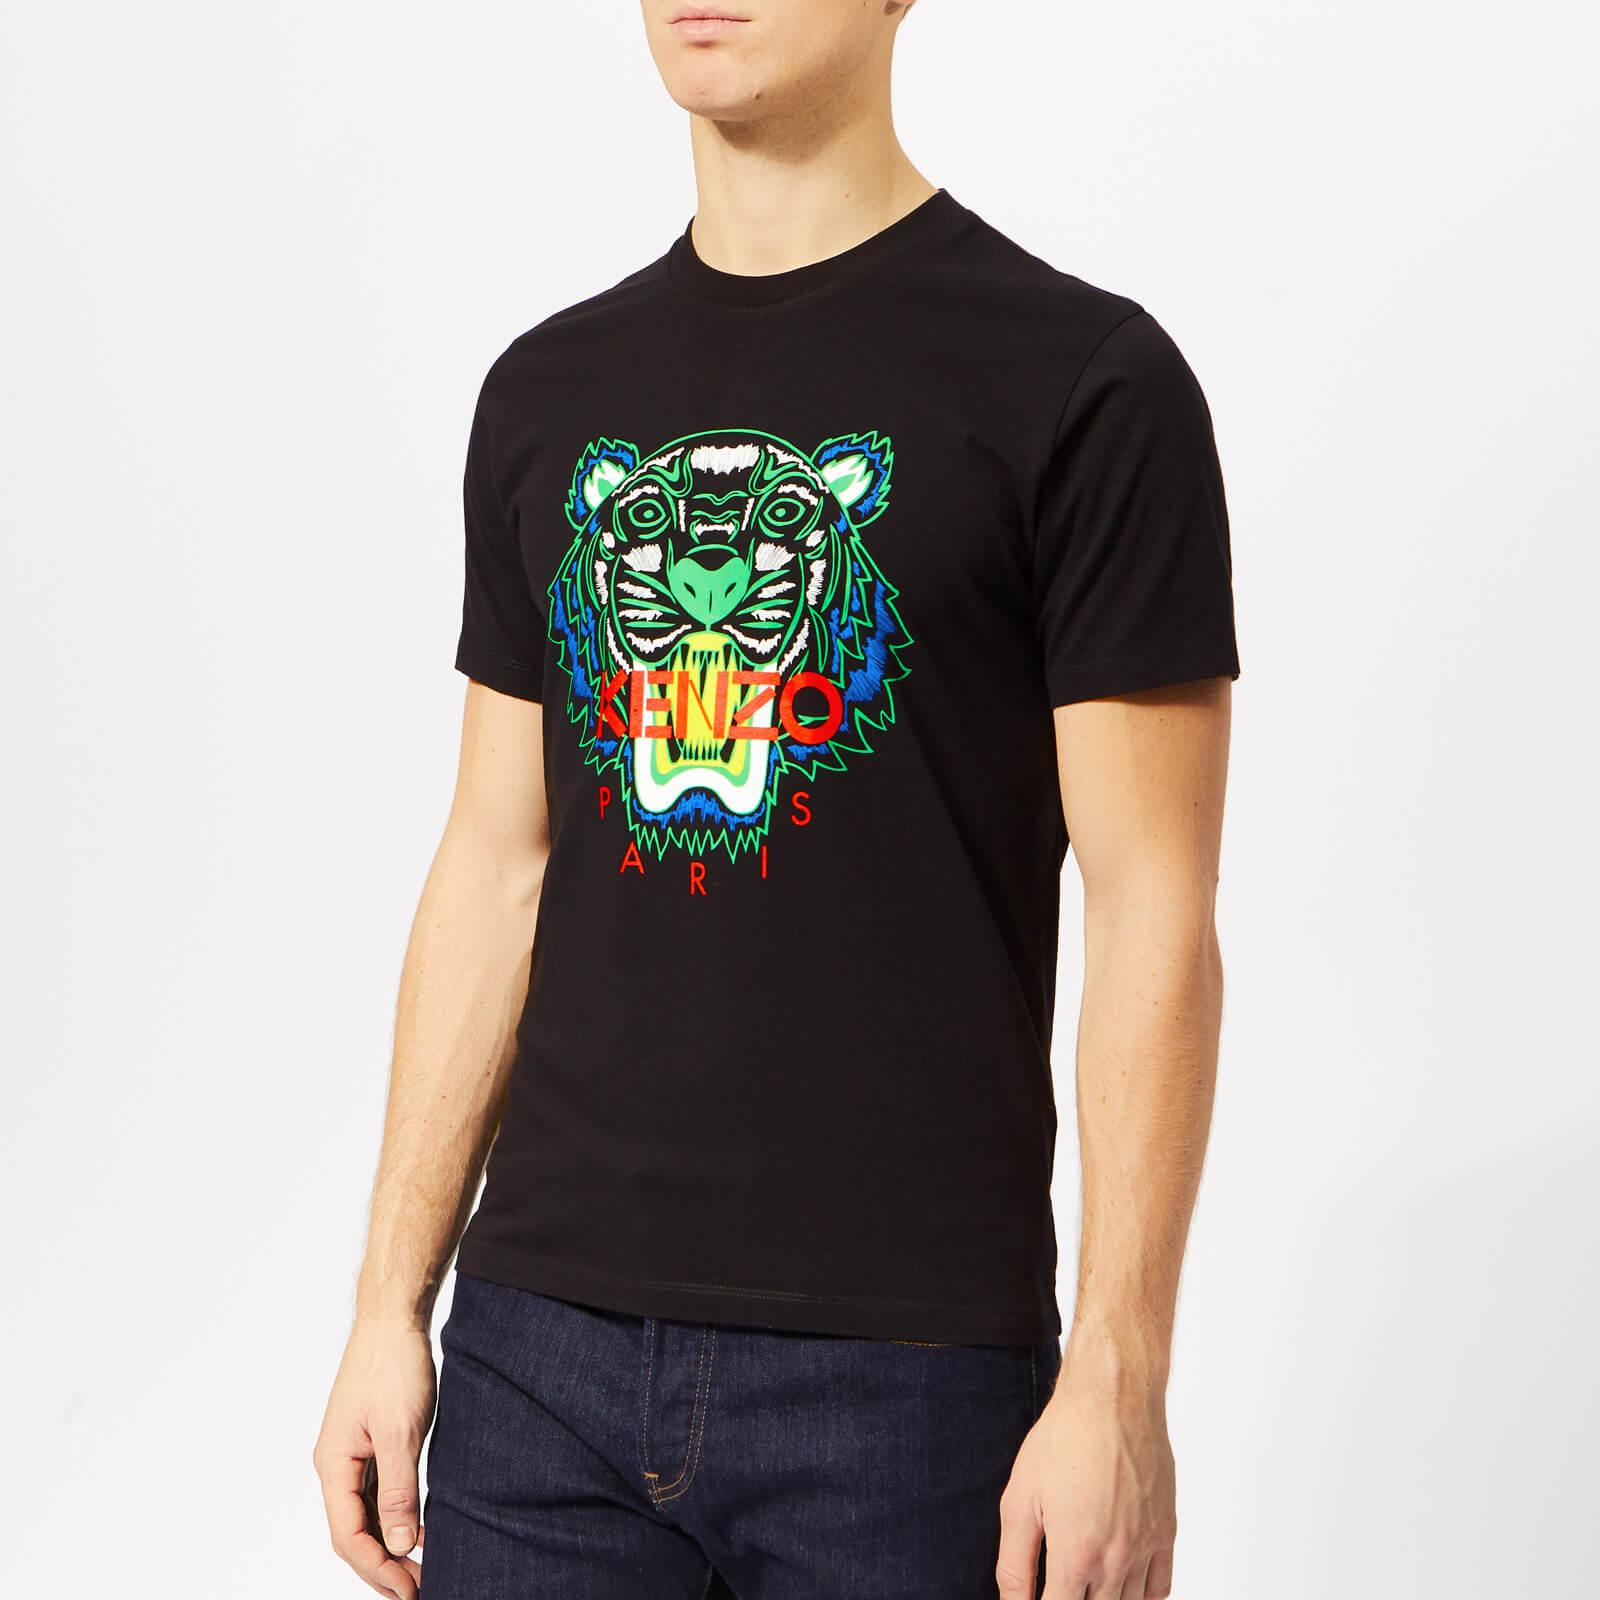 edddccab KENZO Men's Icon T-Shirt - Black - Free UK Delivery over £50